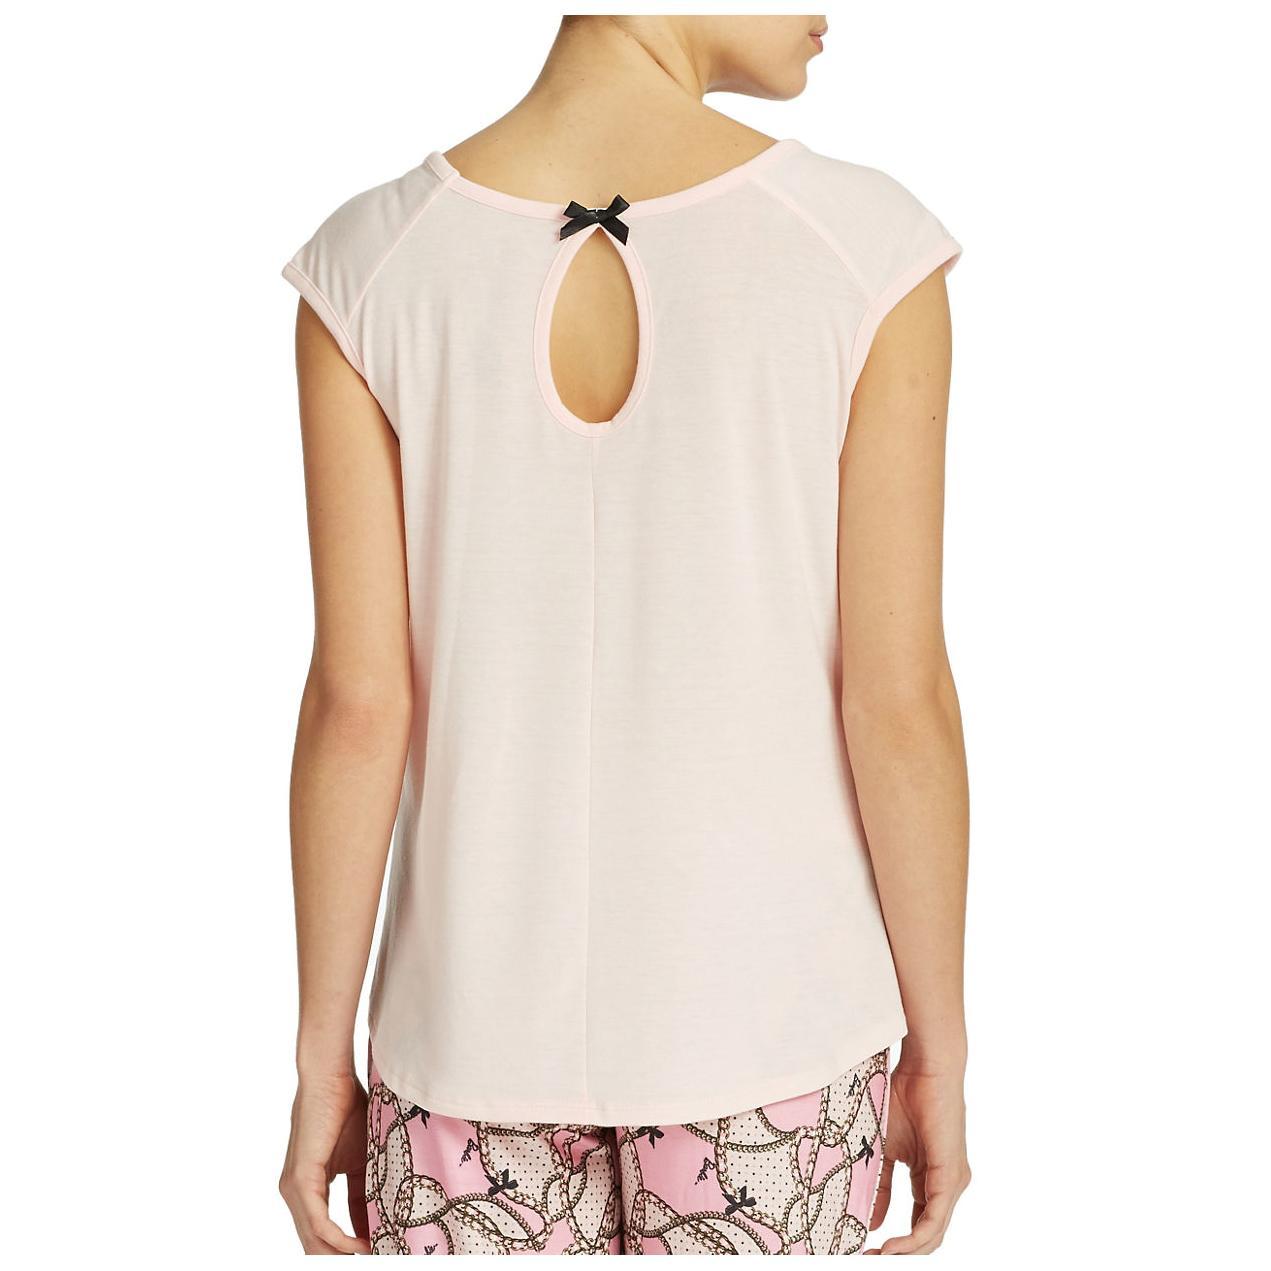 MATTEL BARBIE Adult Pink Knit Pajama Sleep Top Amp Bottom